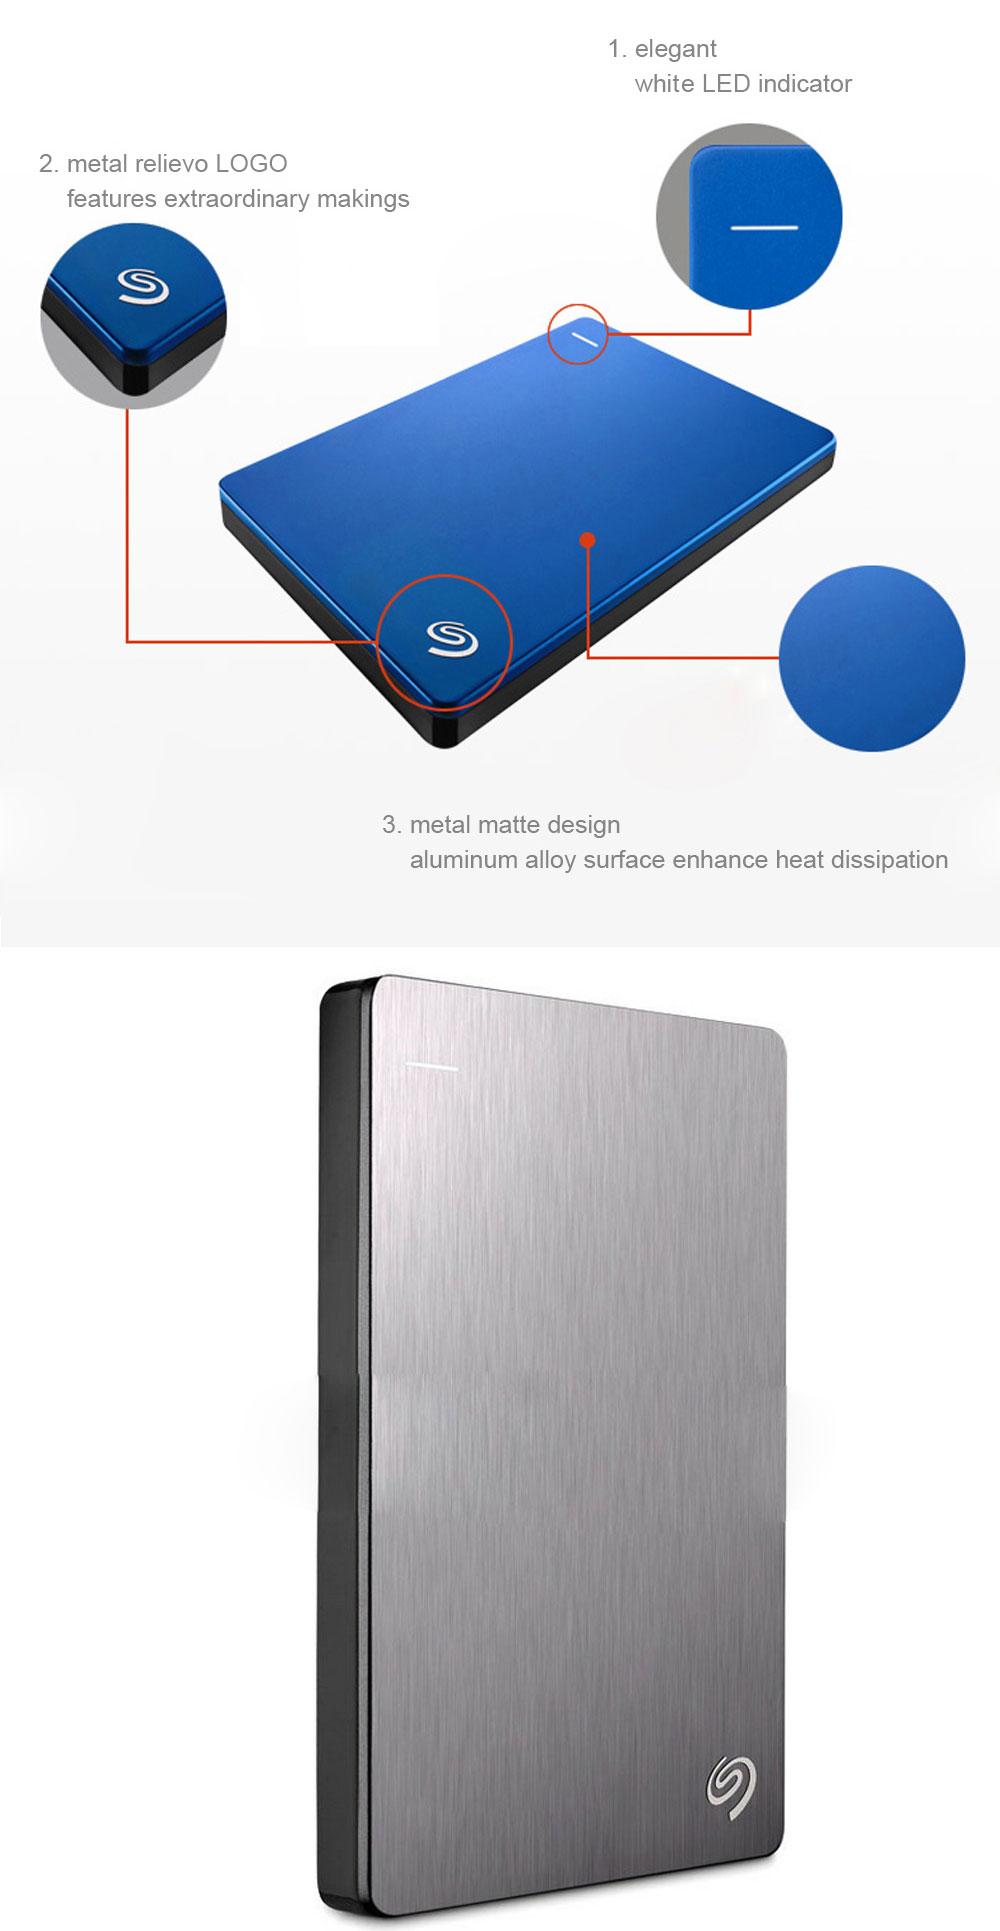 Seagate-External-HDD-Disk-1TB_08